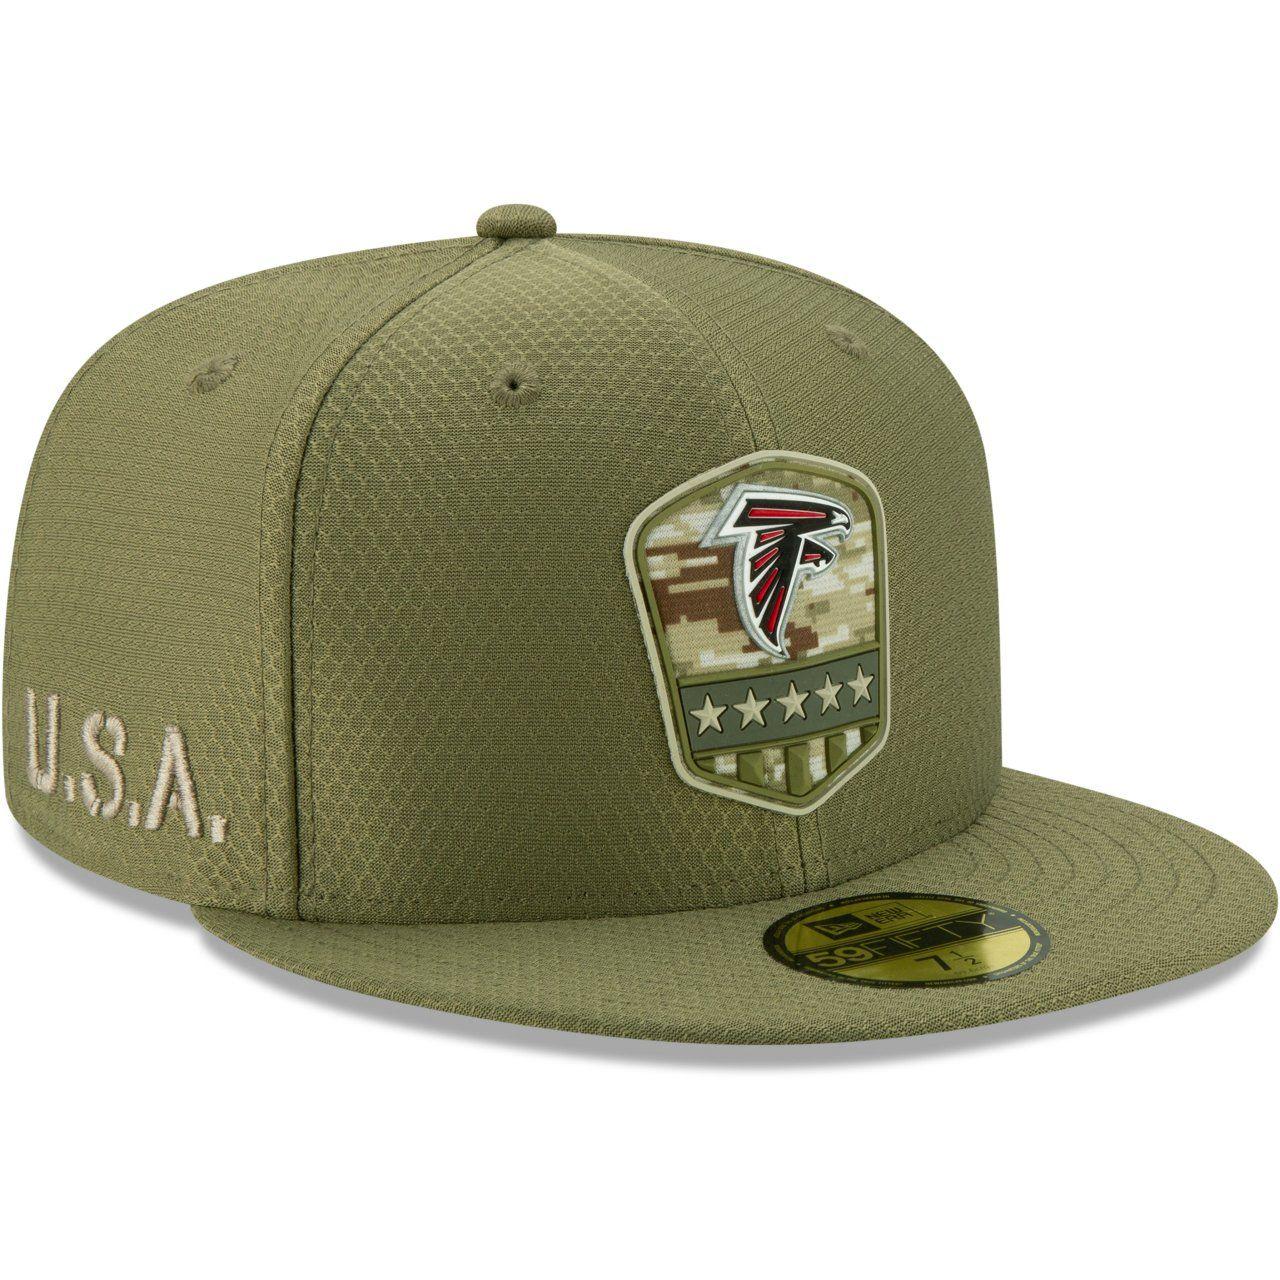 amfoo - New Era 59Fifty Cap - Salute to Service NFL Atlanta Falcons